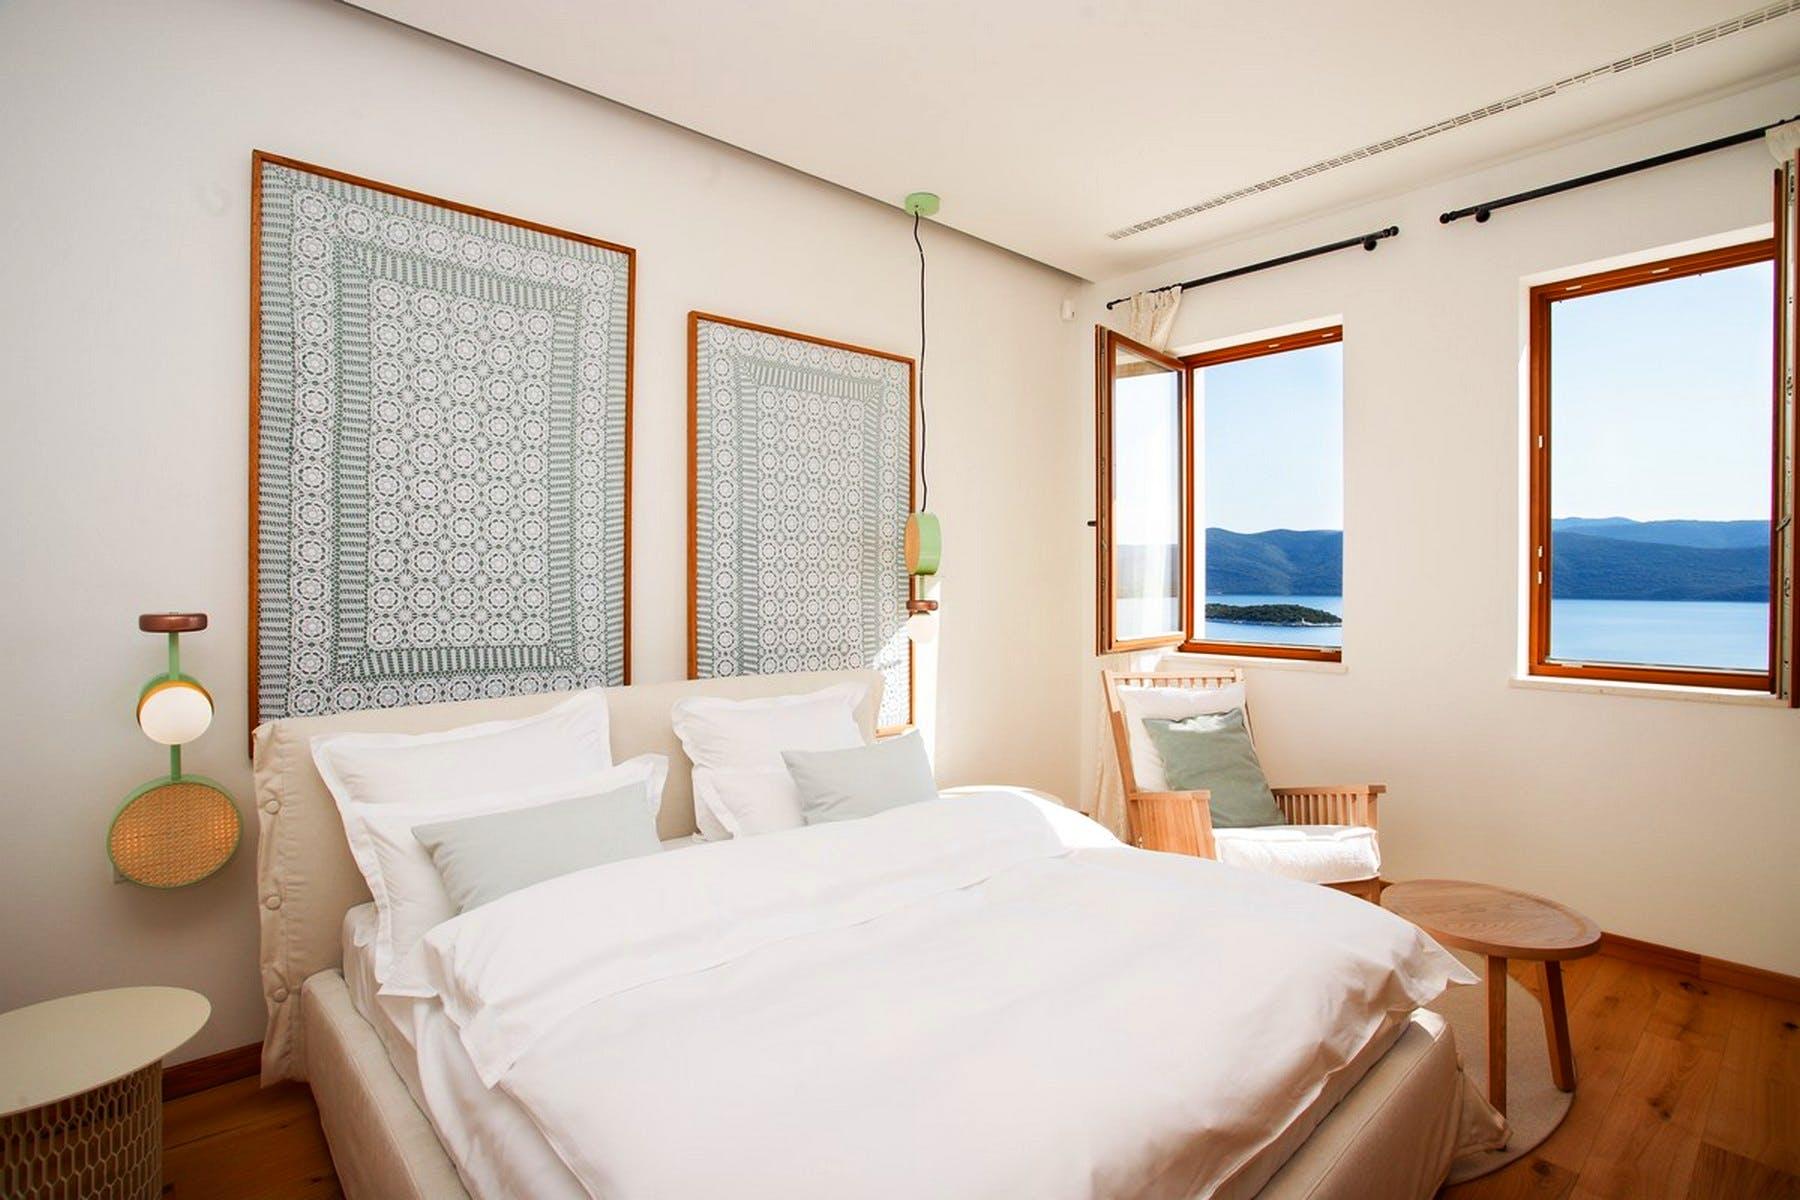 Bright double bedroom